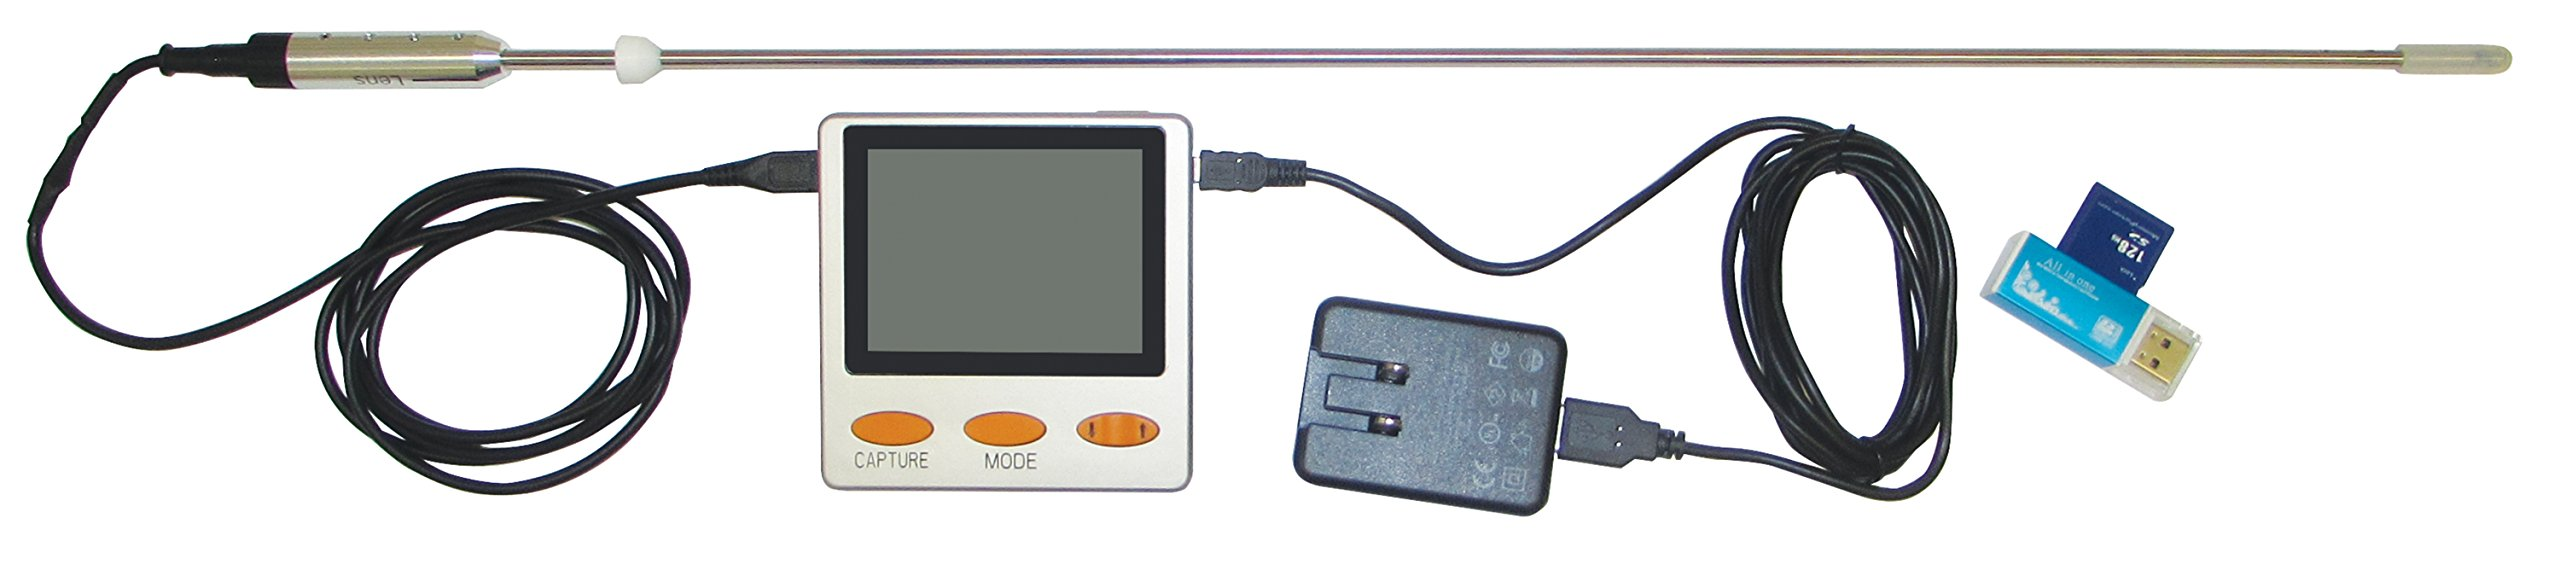 Lyman Products Borecam Digital Borescope with Monitor